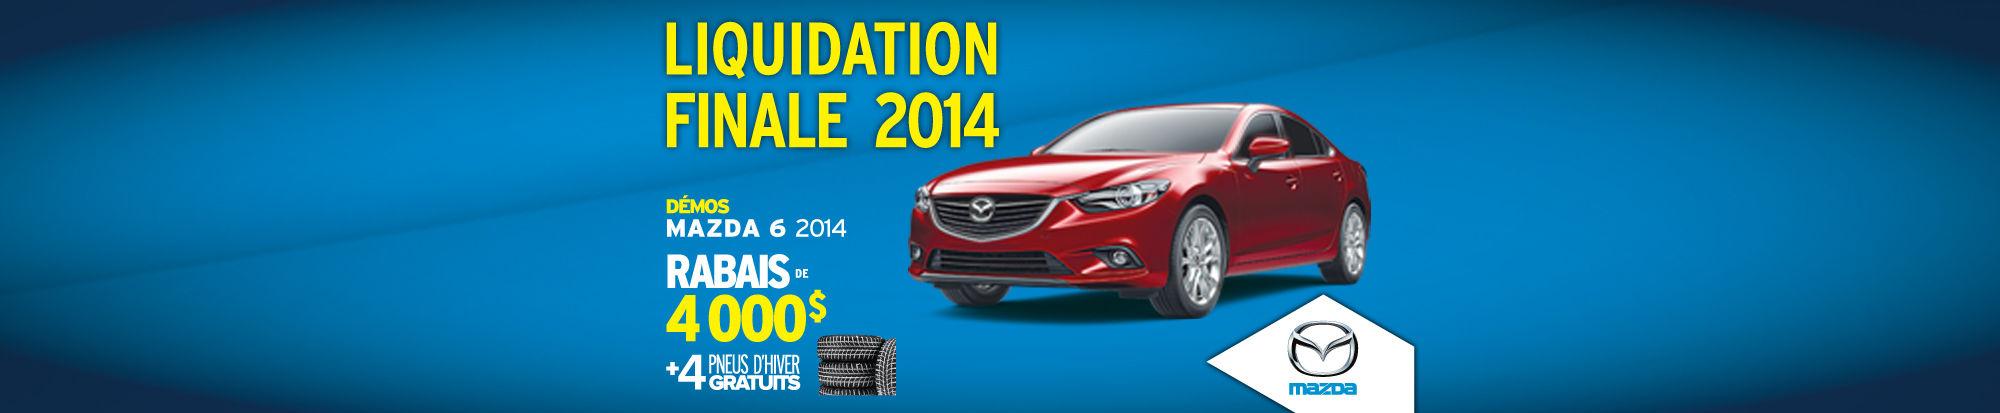 Mazda6 2014 liquidation